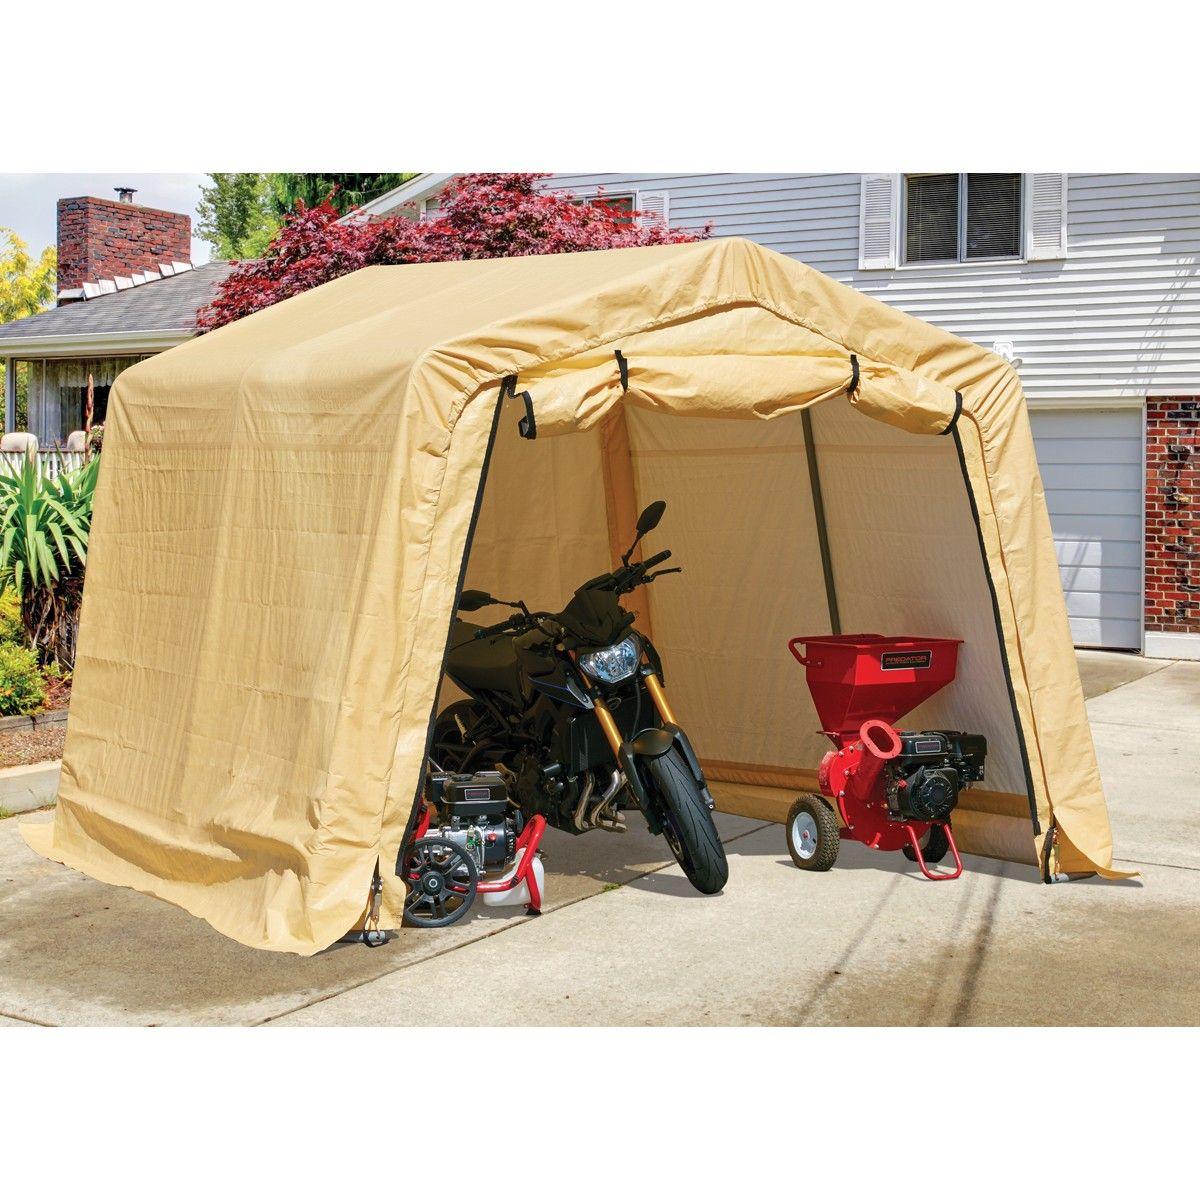 10 ft. x 10 ft. Portable Shed Portable sheds, Portable